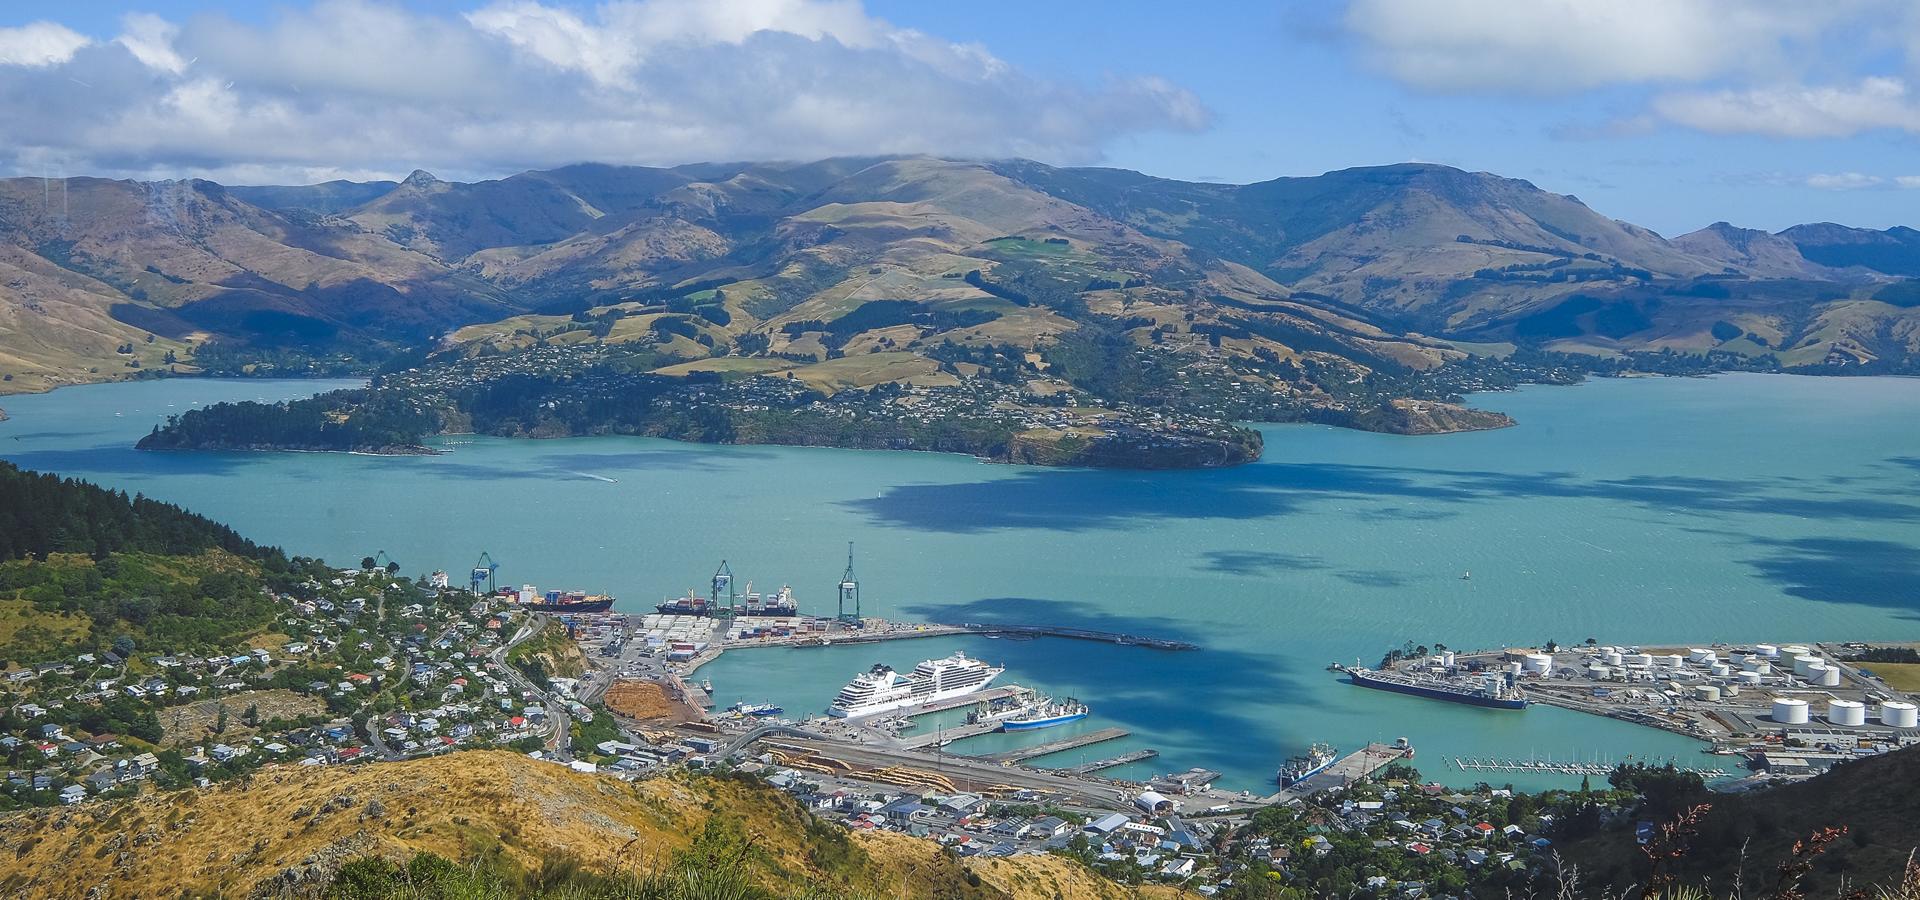 Peer-to-peer advisory in Christchurch, Canterbury, New Zealand